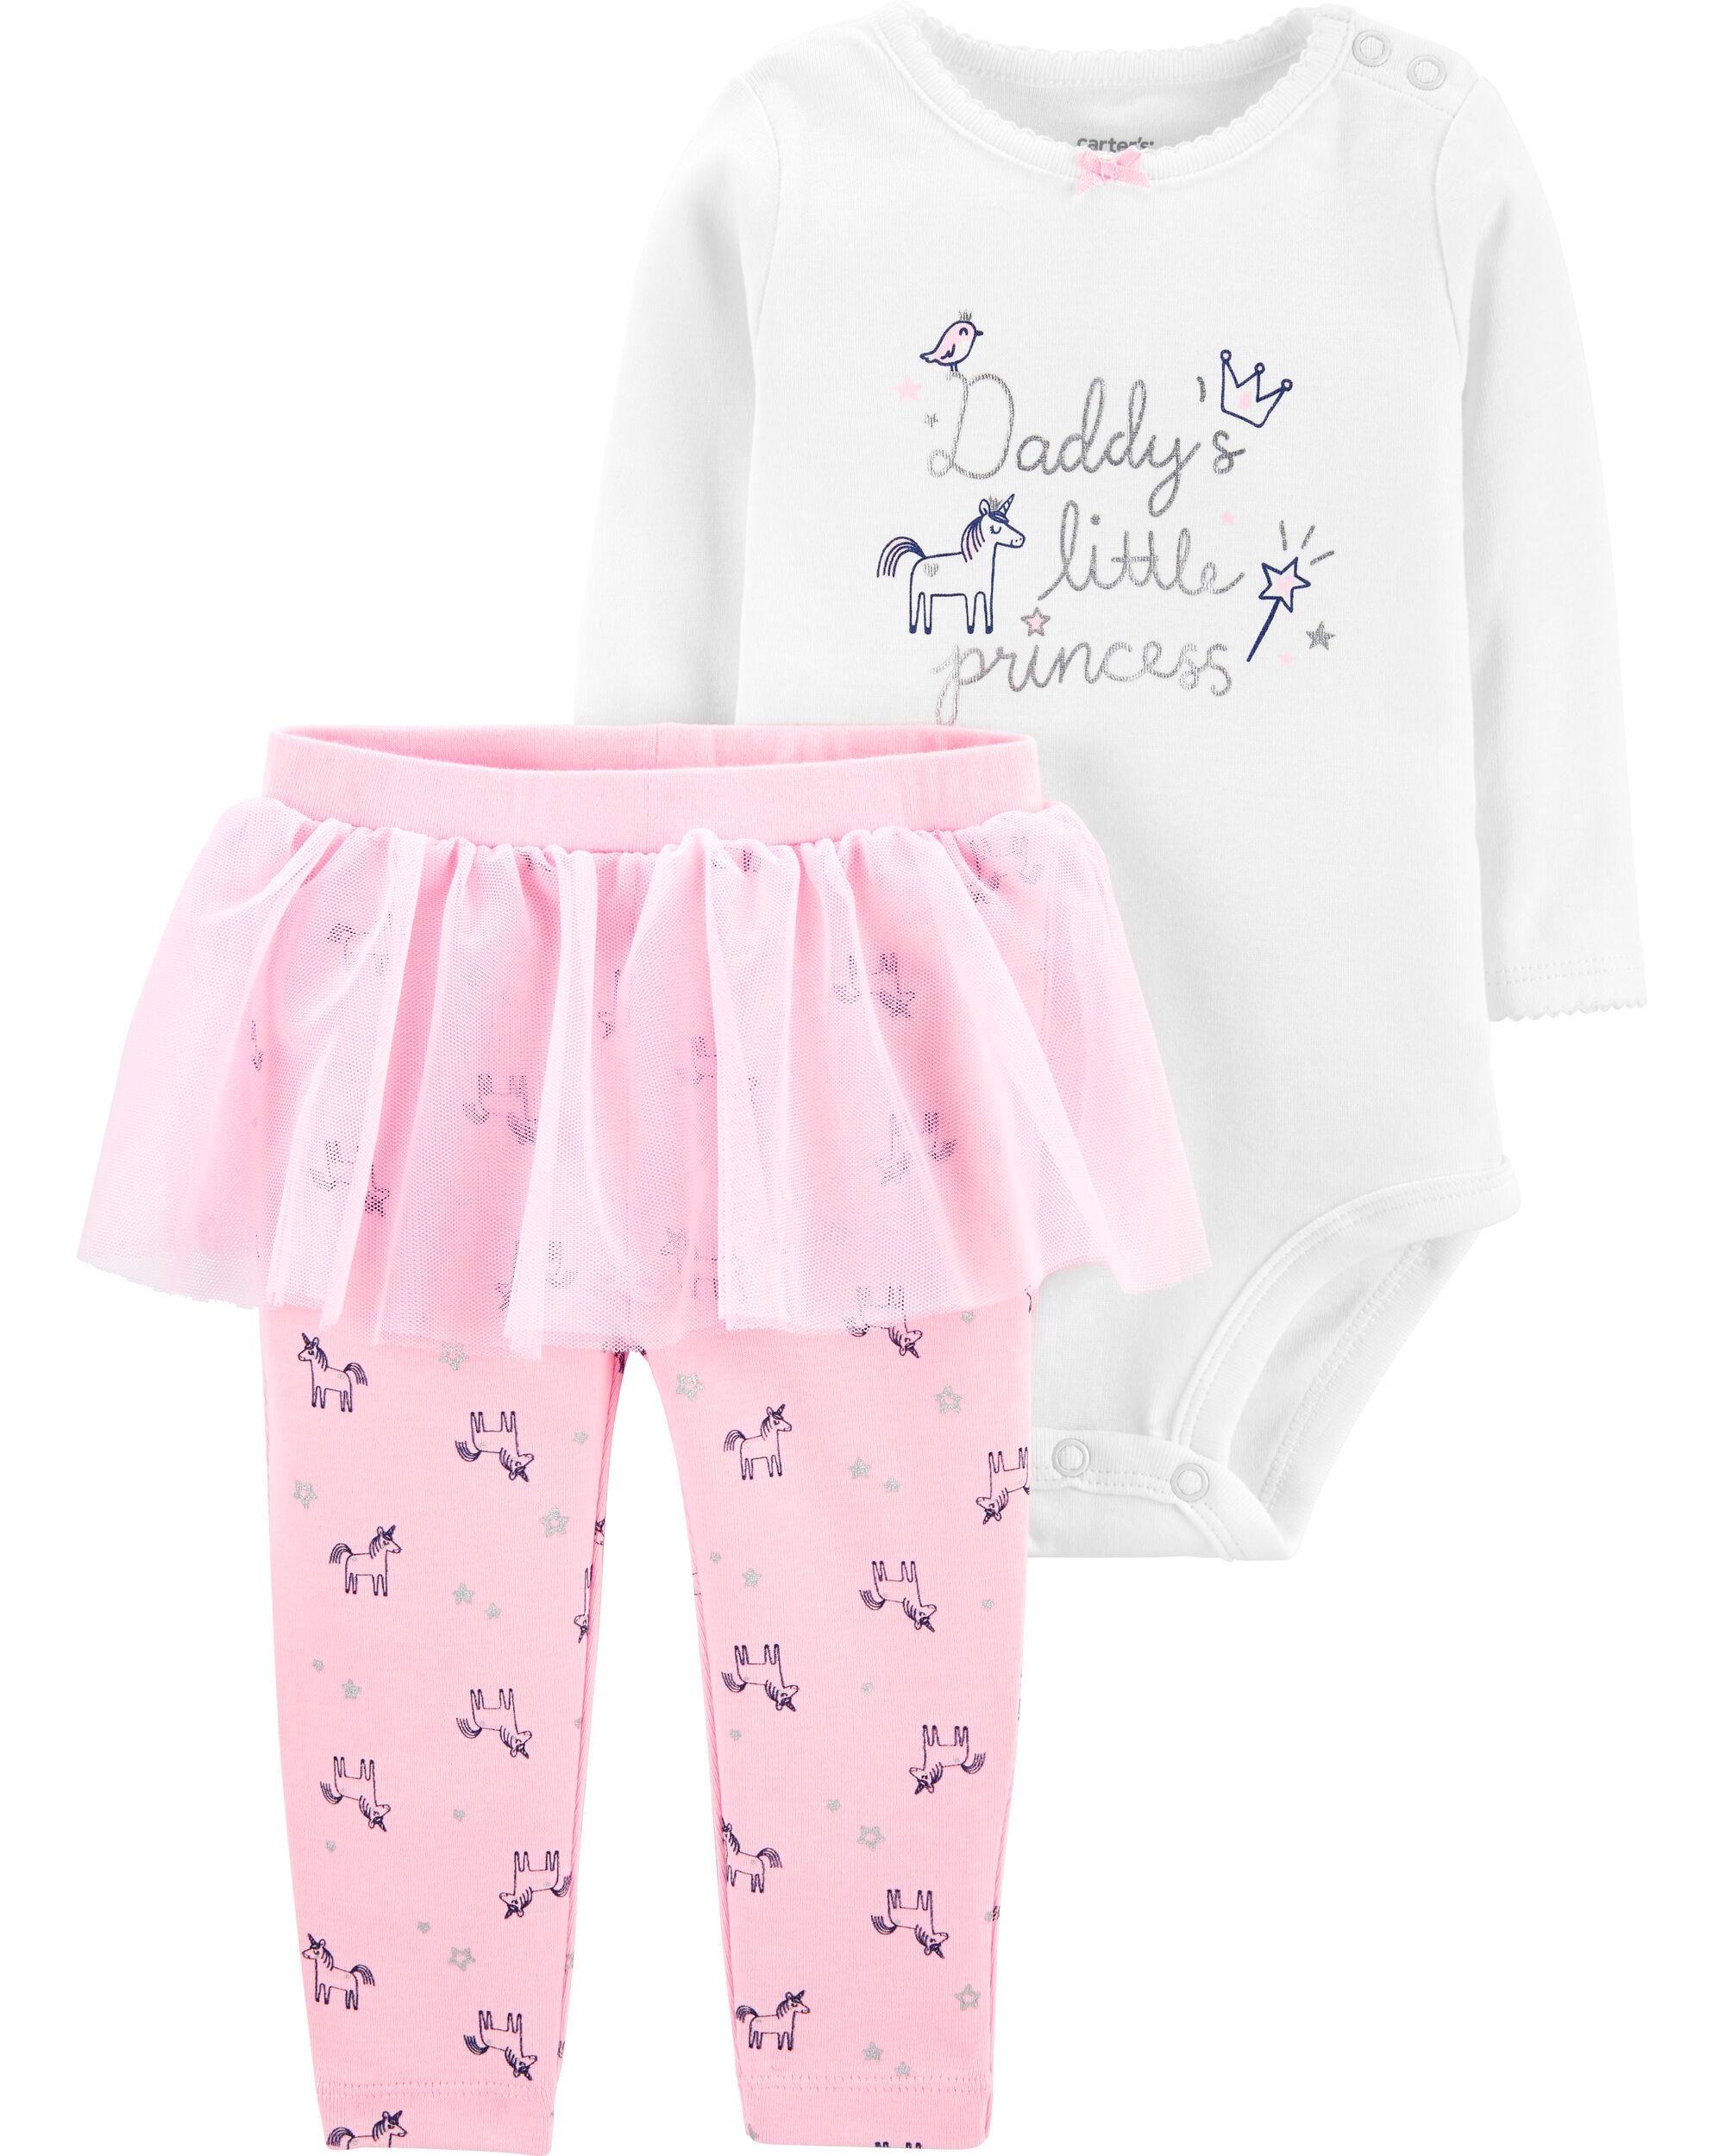 *DOORBUSTER* 2-Piece Daddy's Little Princess Bodysuit & Tutu Pant Set